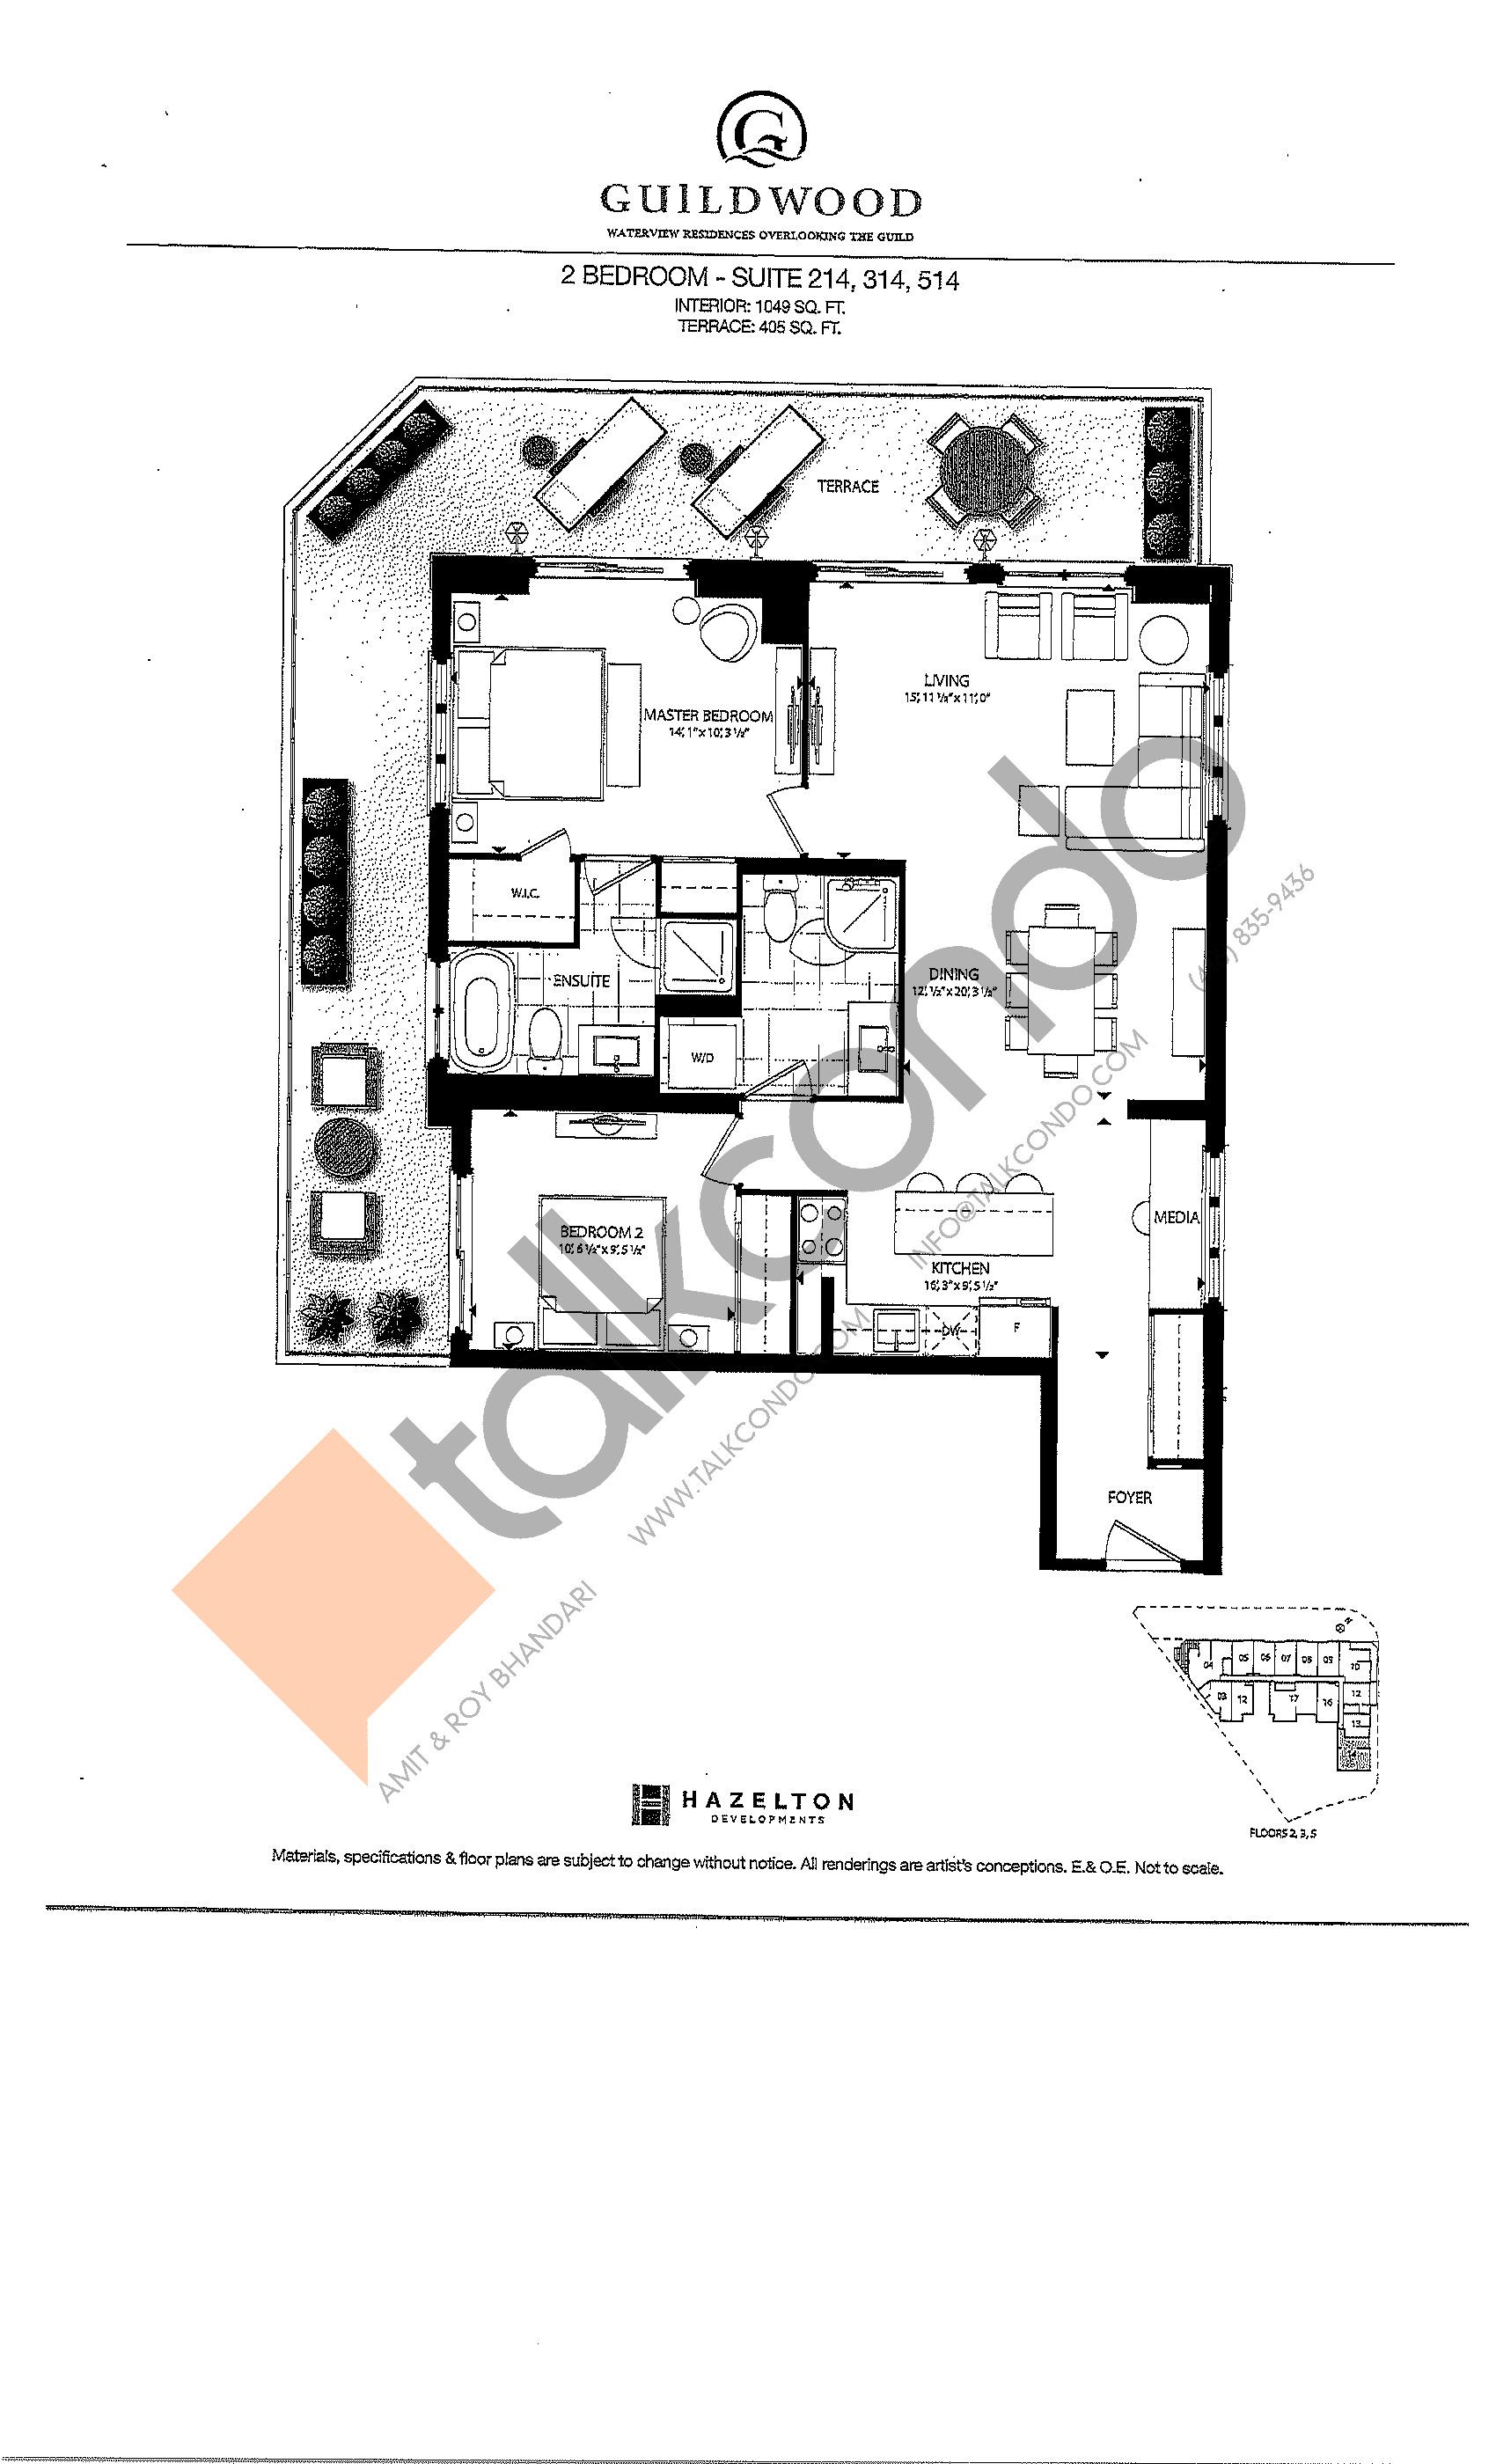 Suite 214, 314, 514 Floor Plan at Guildwood Condos - 1049 sq.ft